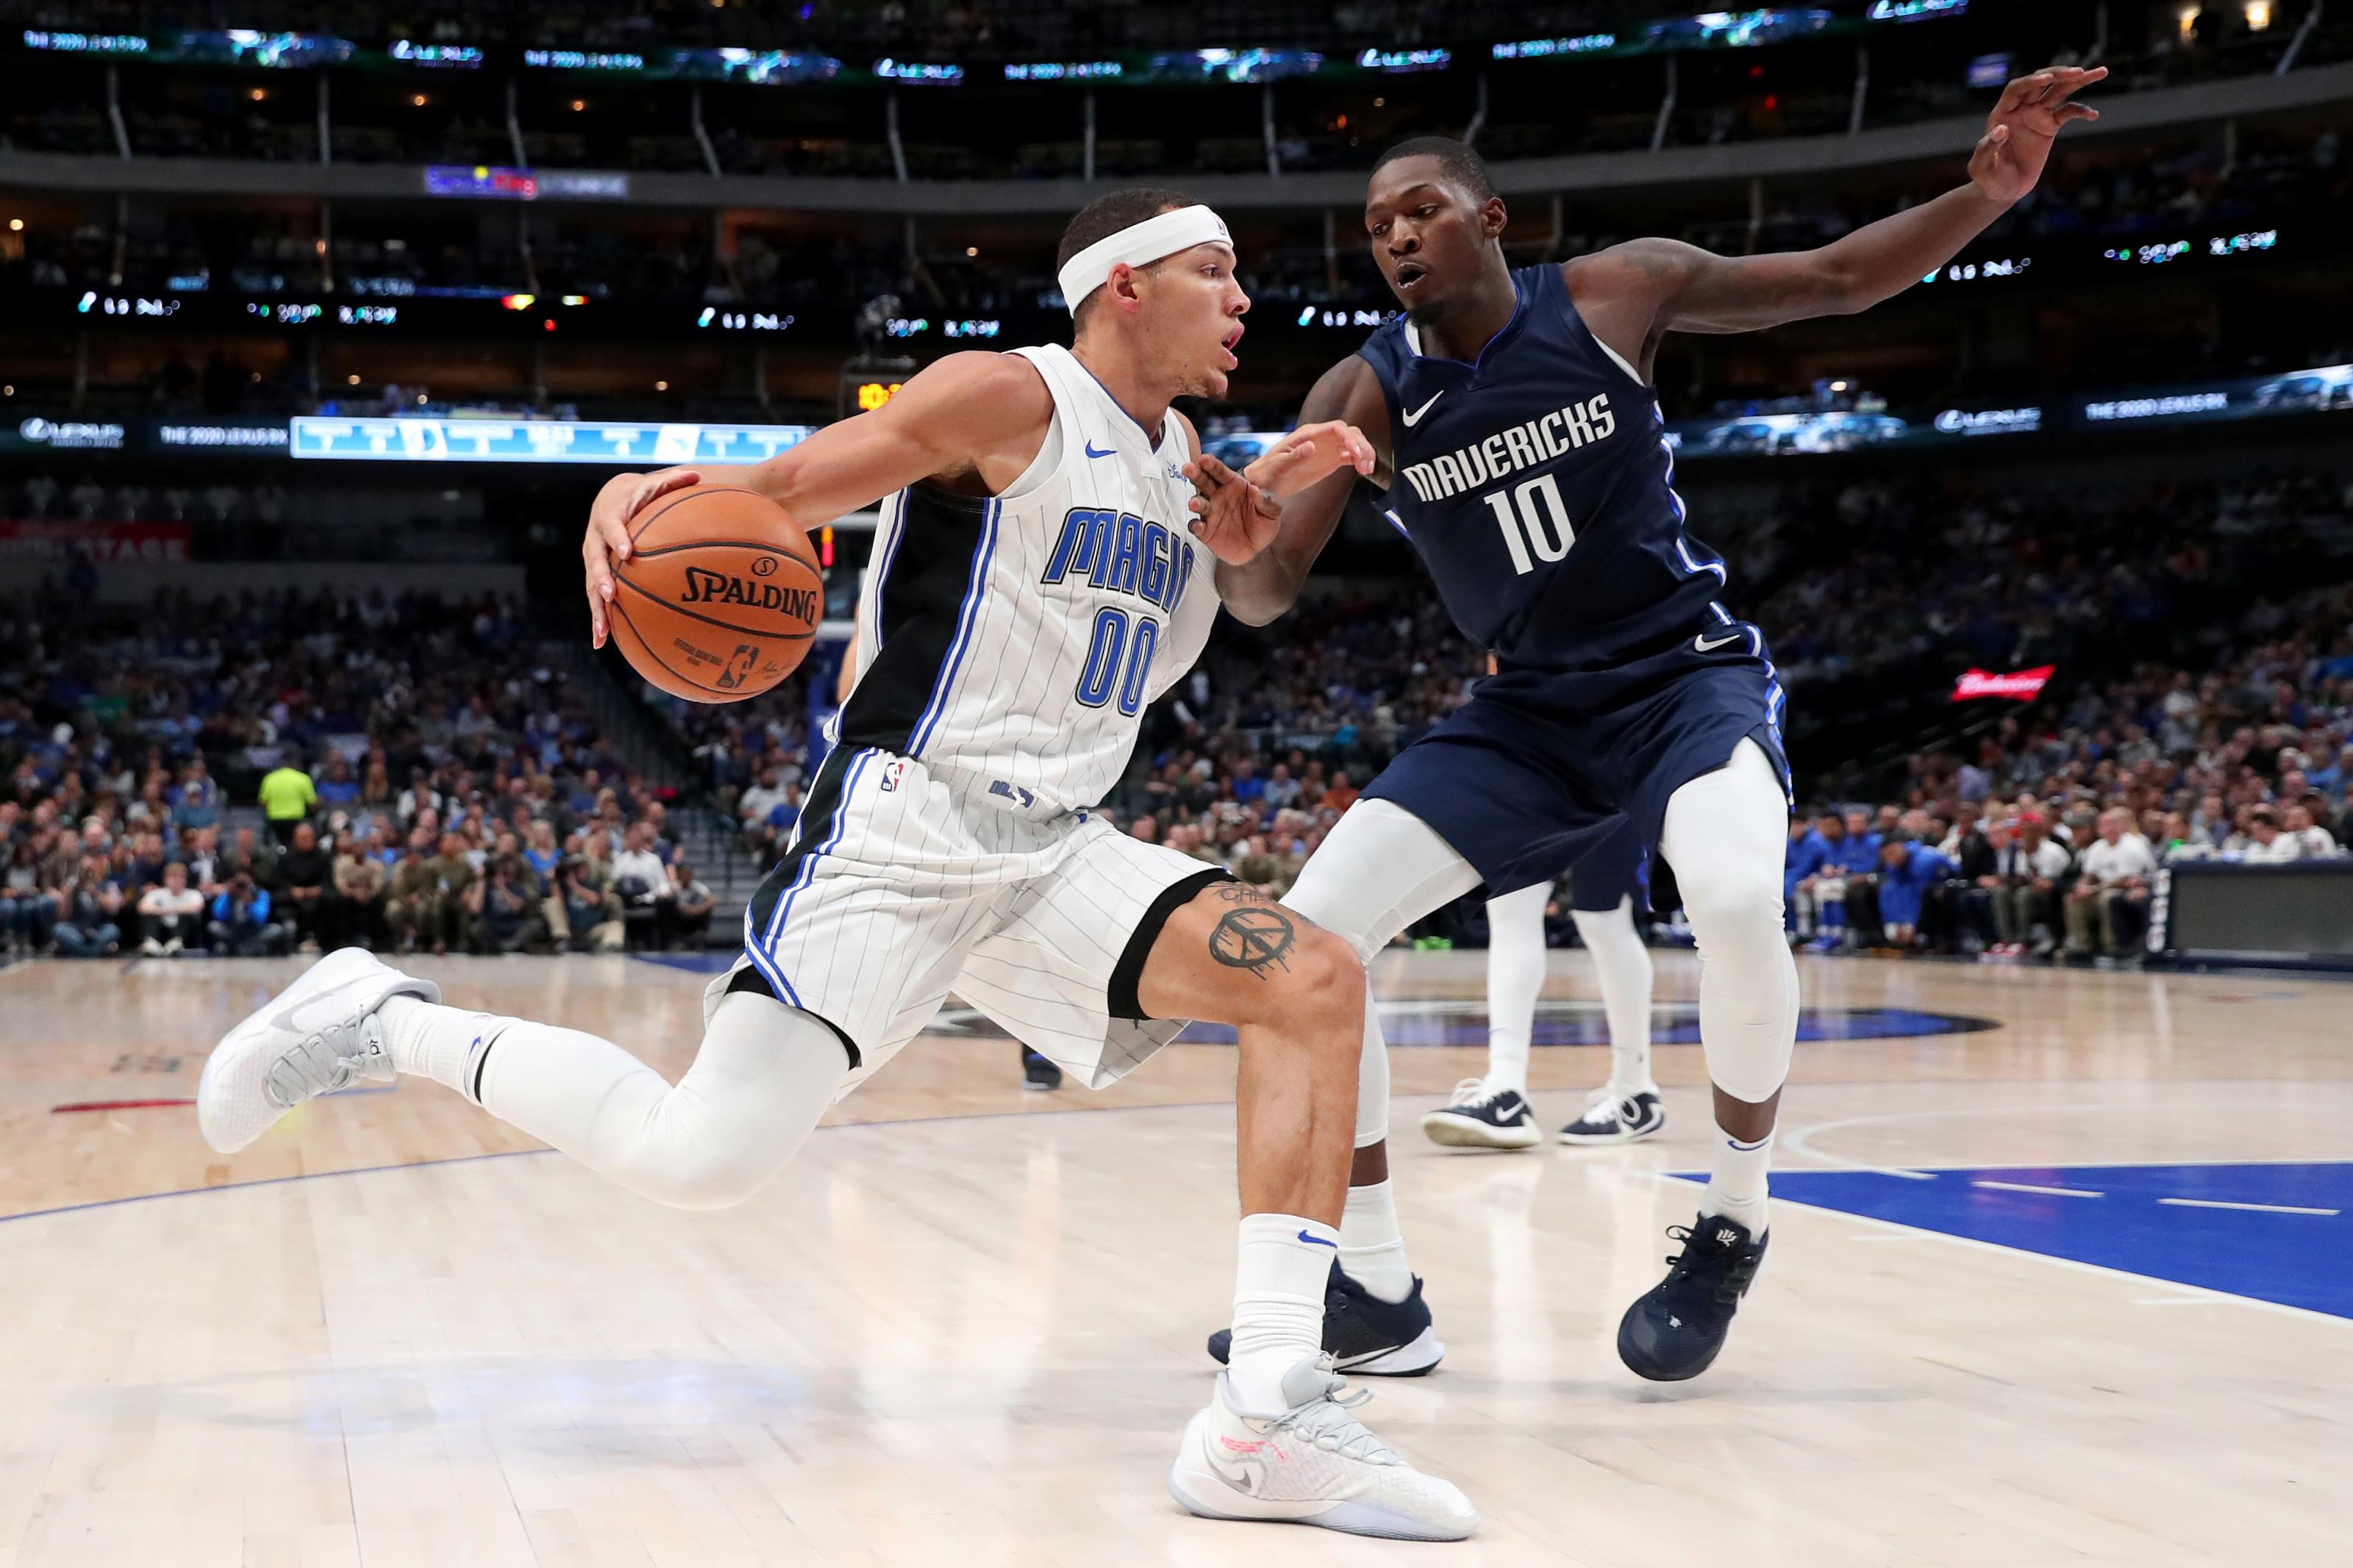 Orlando Magic vs. Dallas Mavericks (Feb. 21, 2020): How to Watch, Odds and Prediction